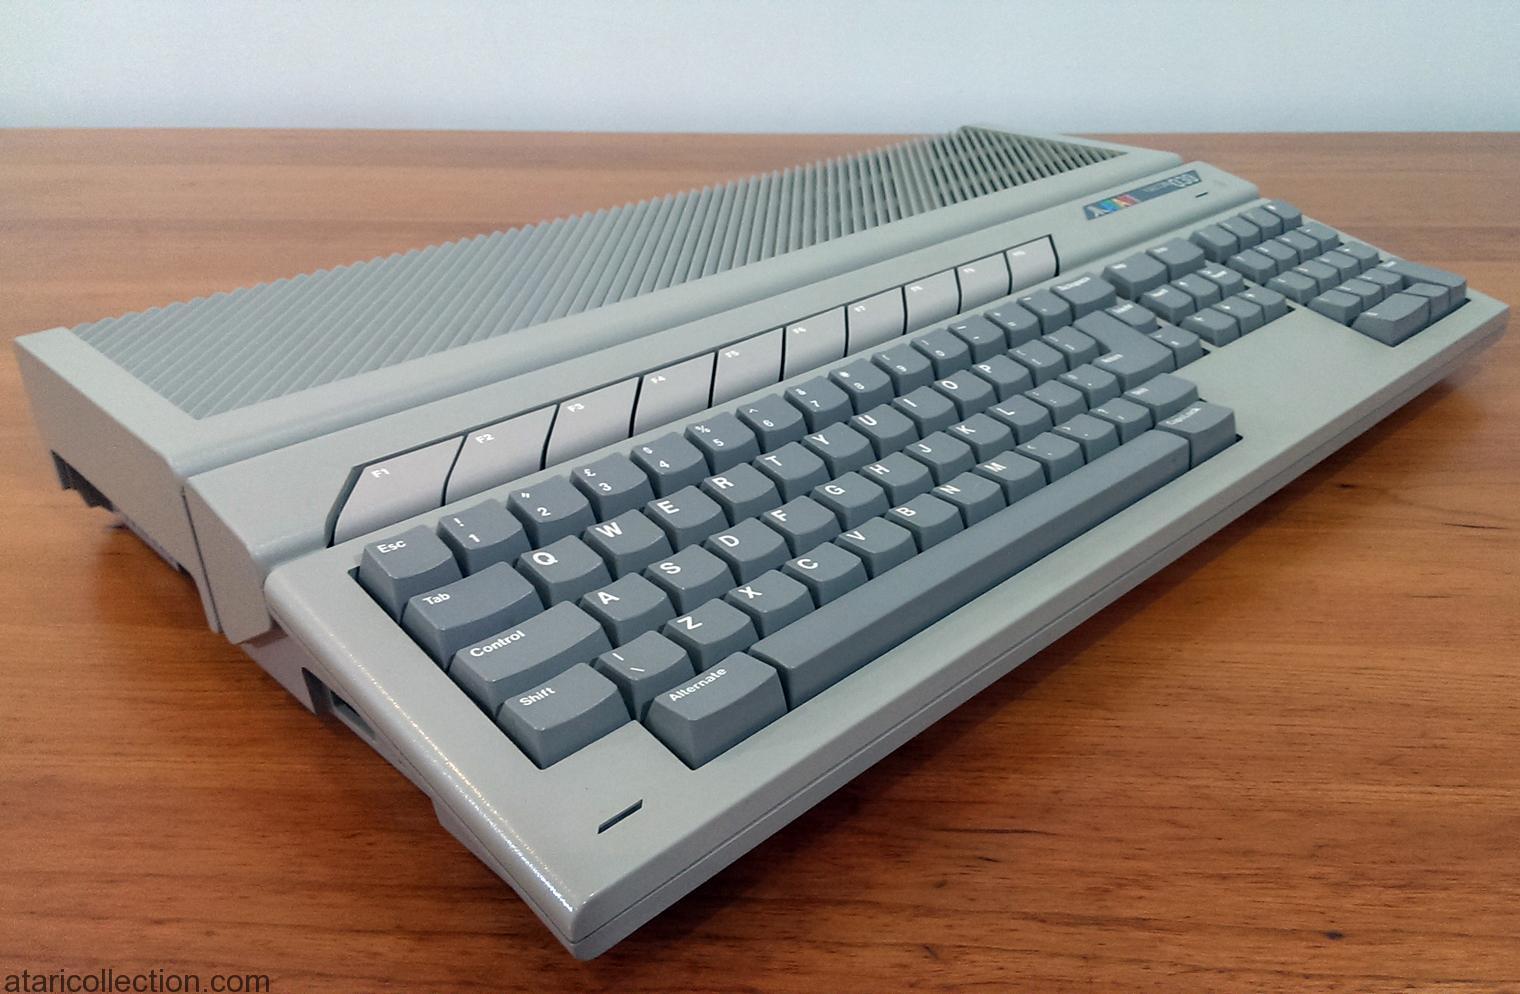 Atari Falcon 030 UK Keyboard - ATARI COLLECTION